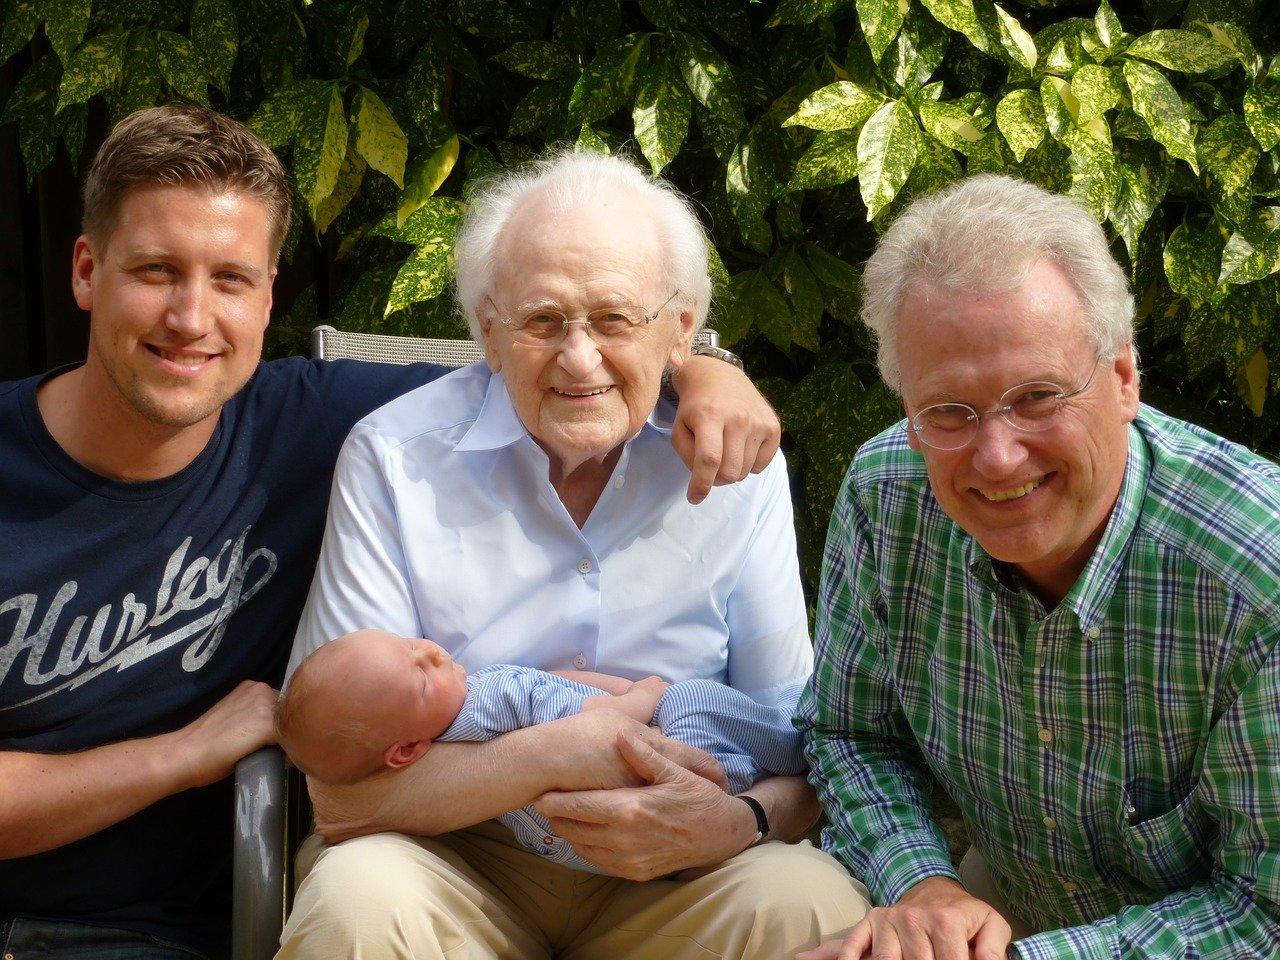 Multi-Generational Homes – Why a Larger Home May Make Sense